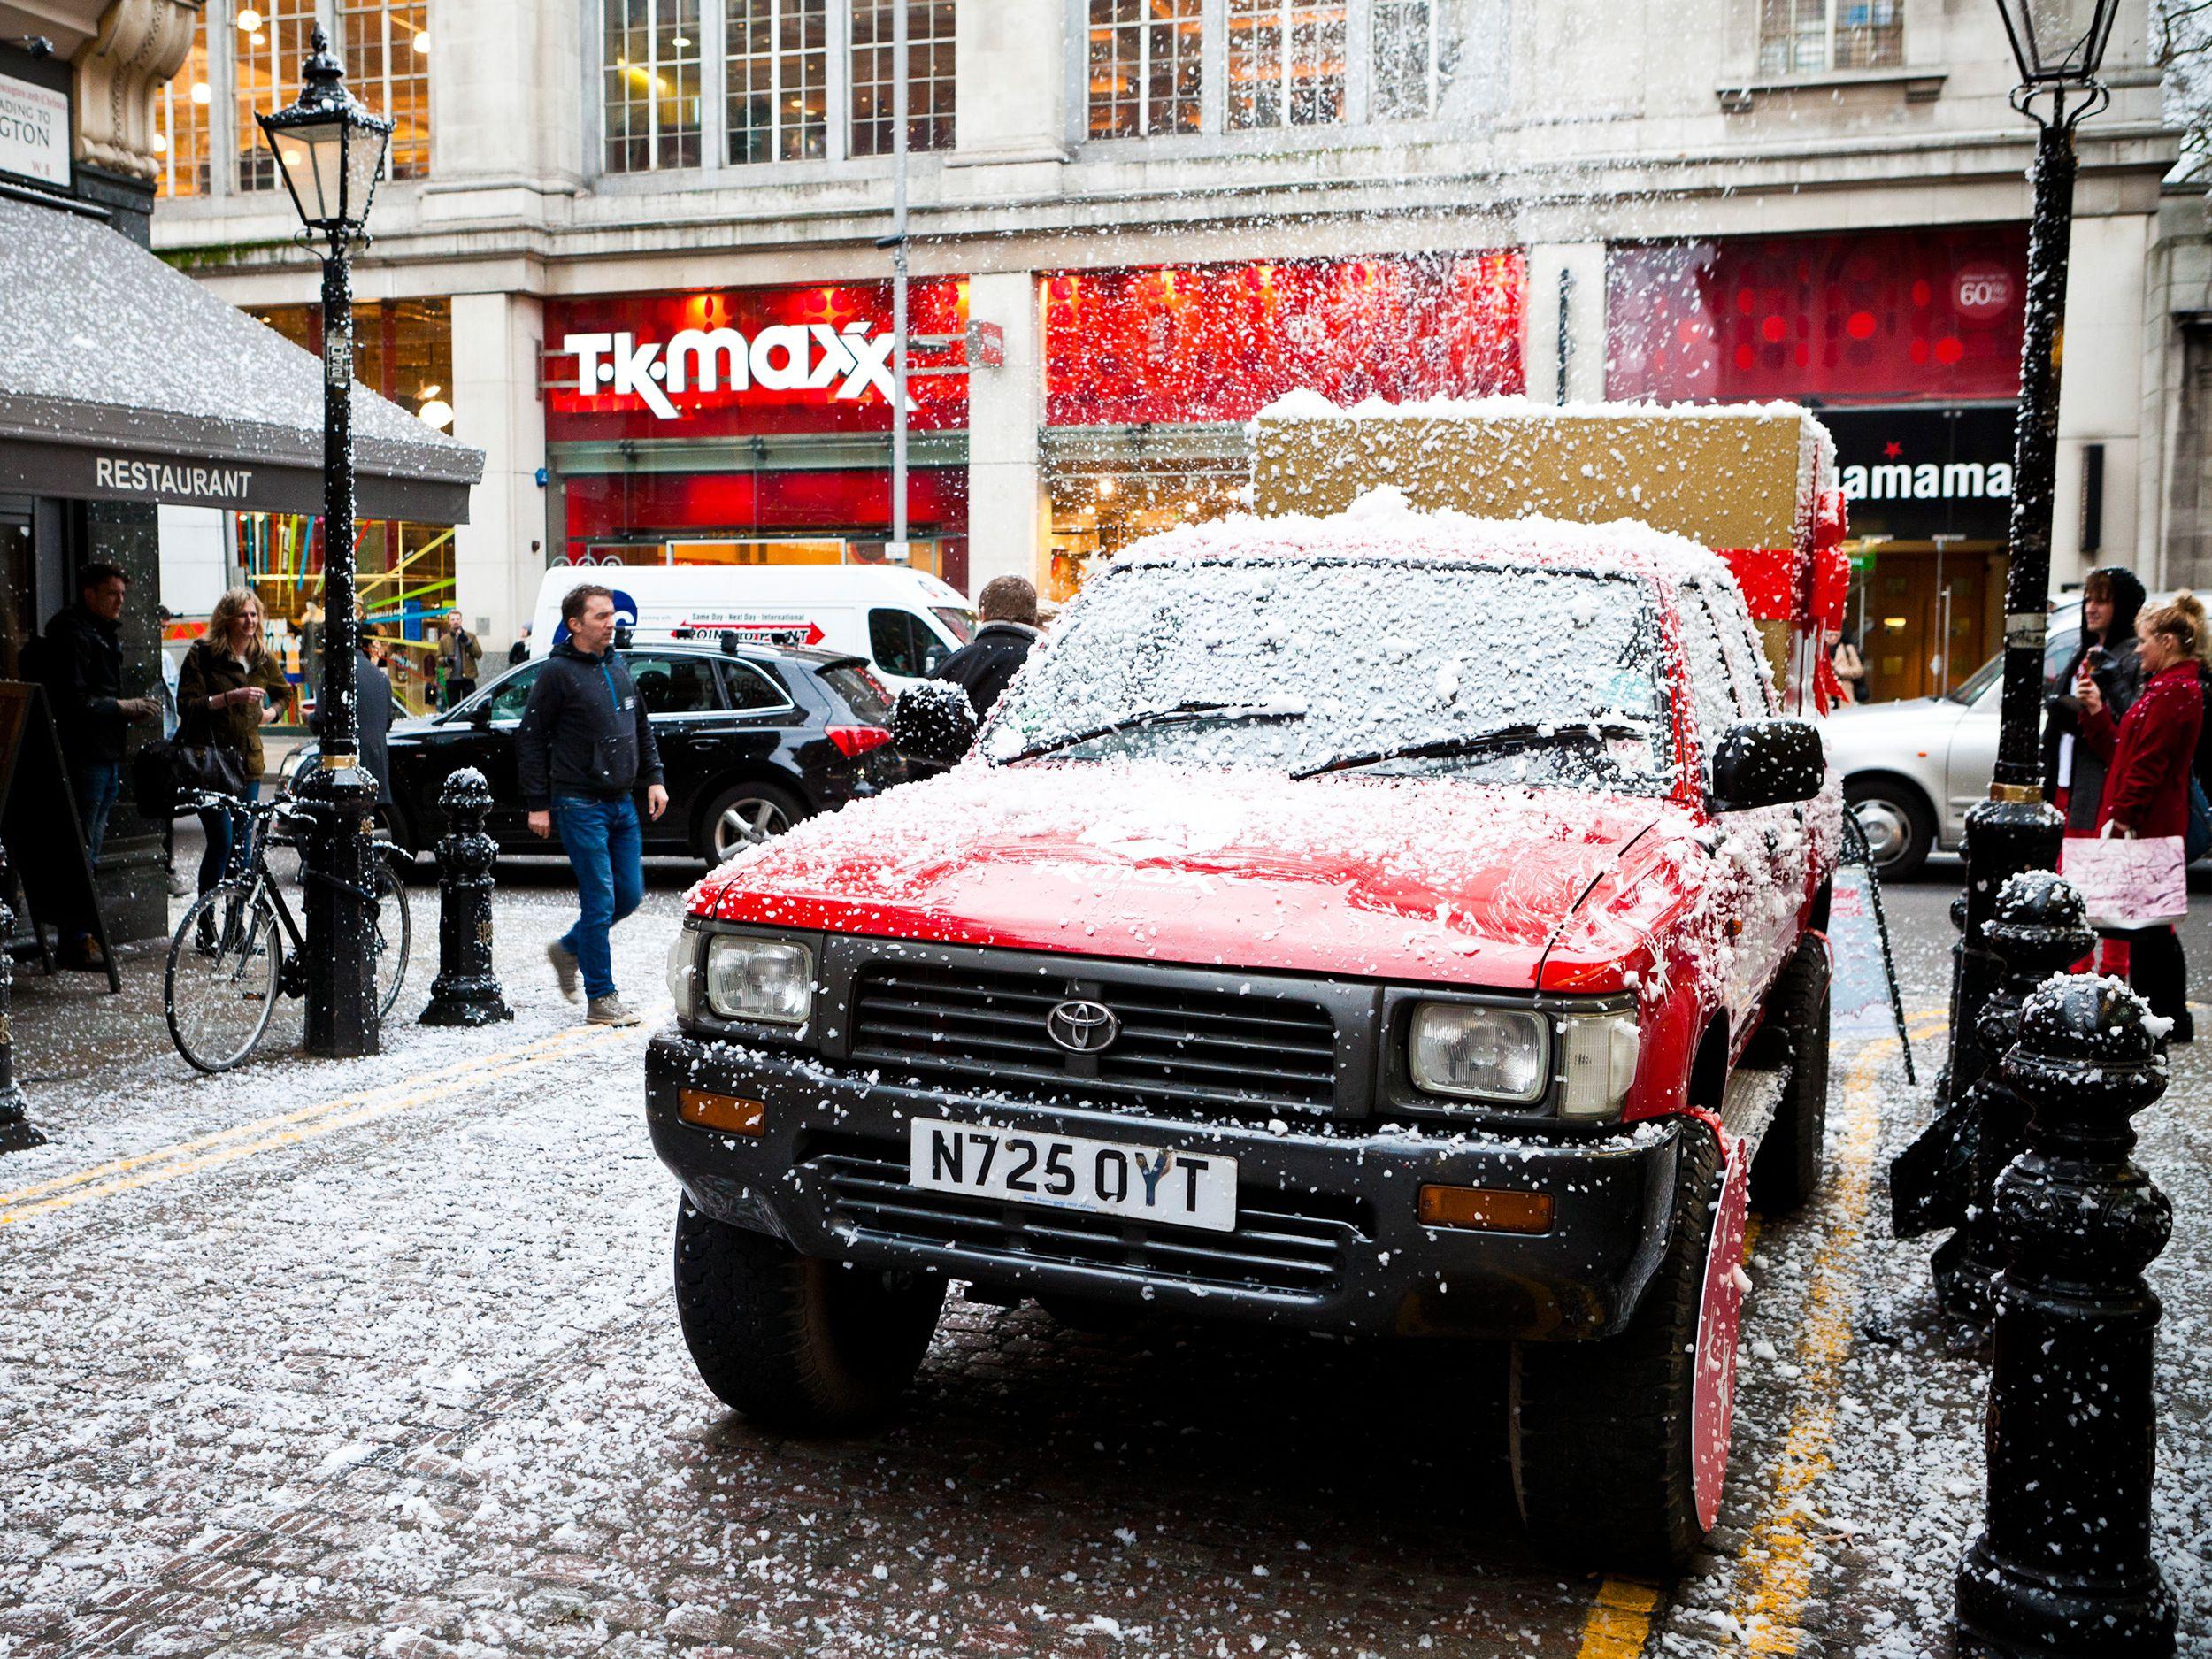 TK_Truck_Parked.jpg